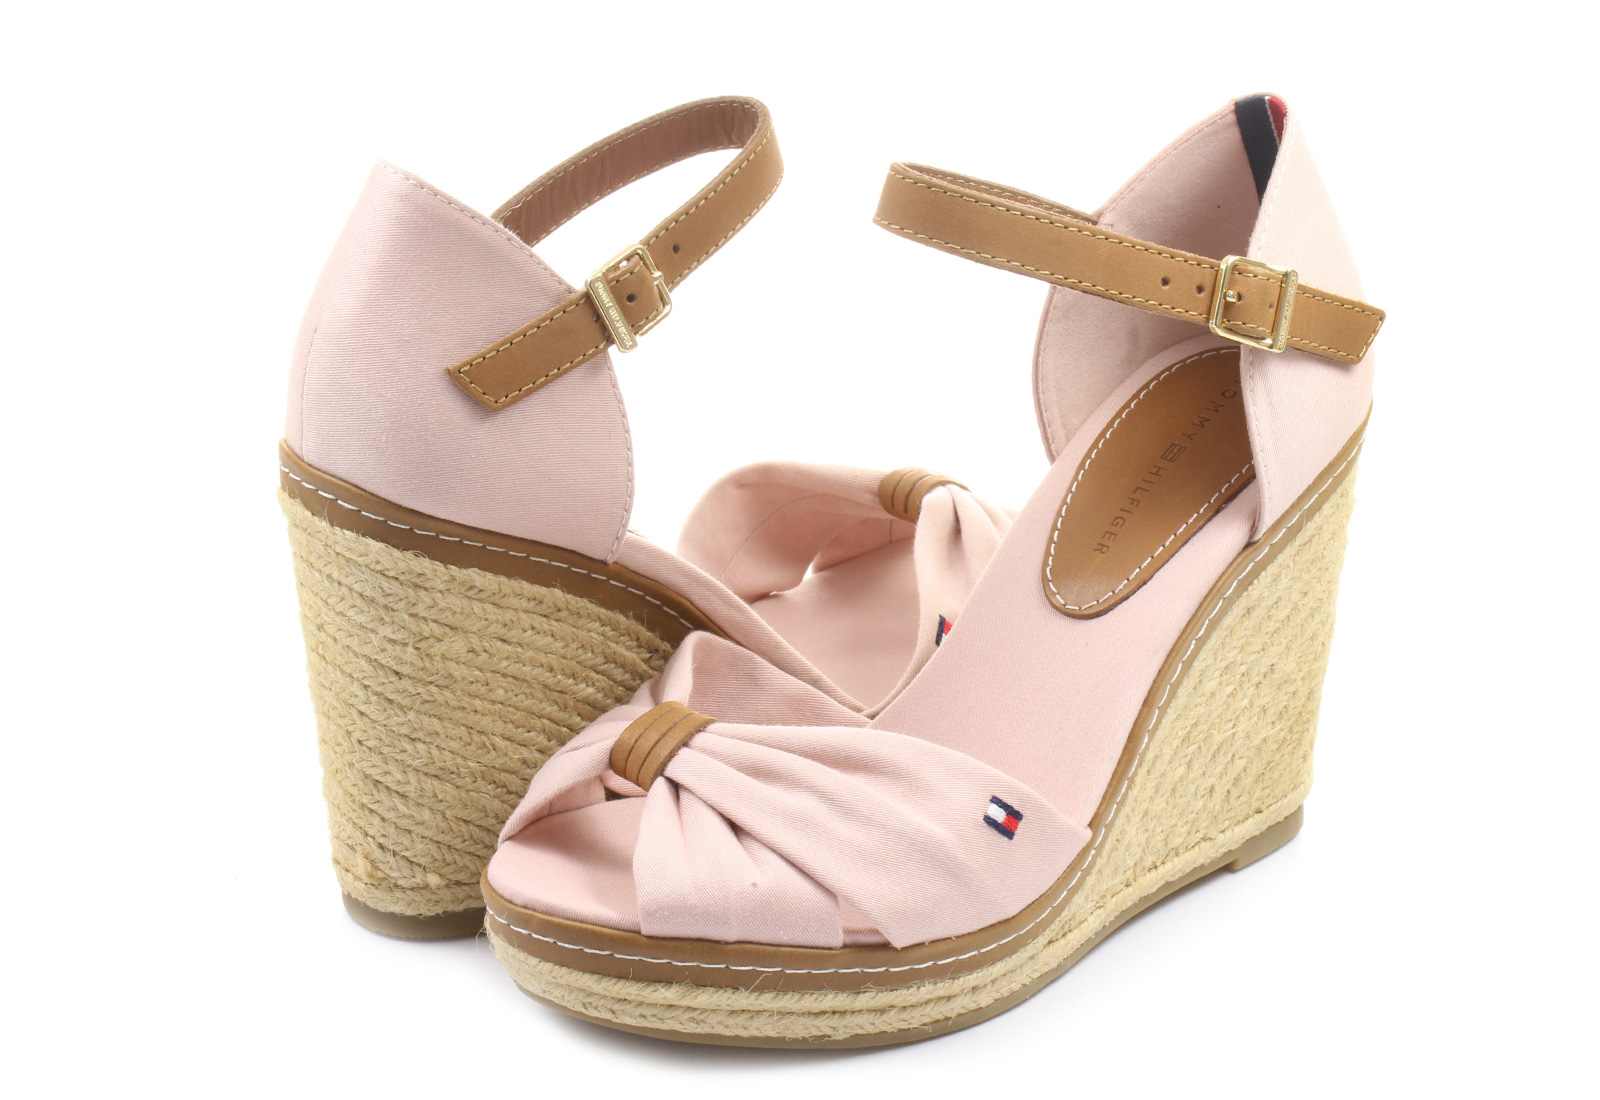 tommy hilfiger platforma roze sandale emery 54d office shoes online  trgovina obu e 6269647935